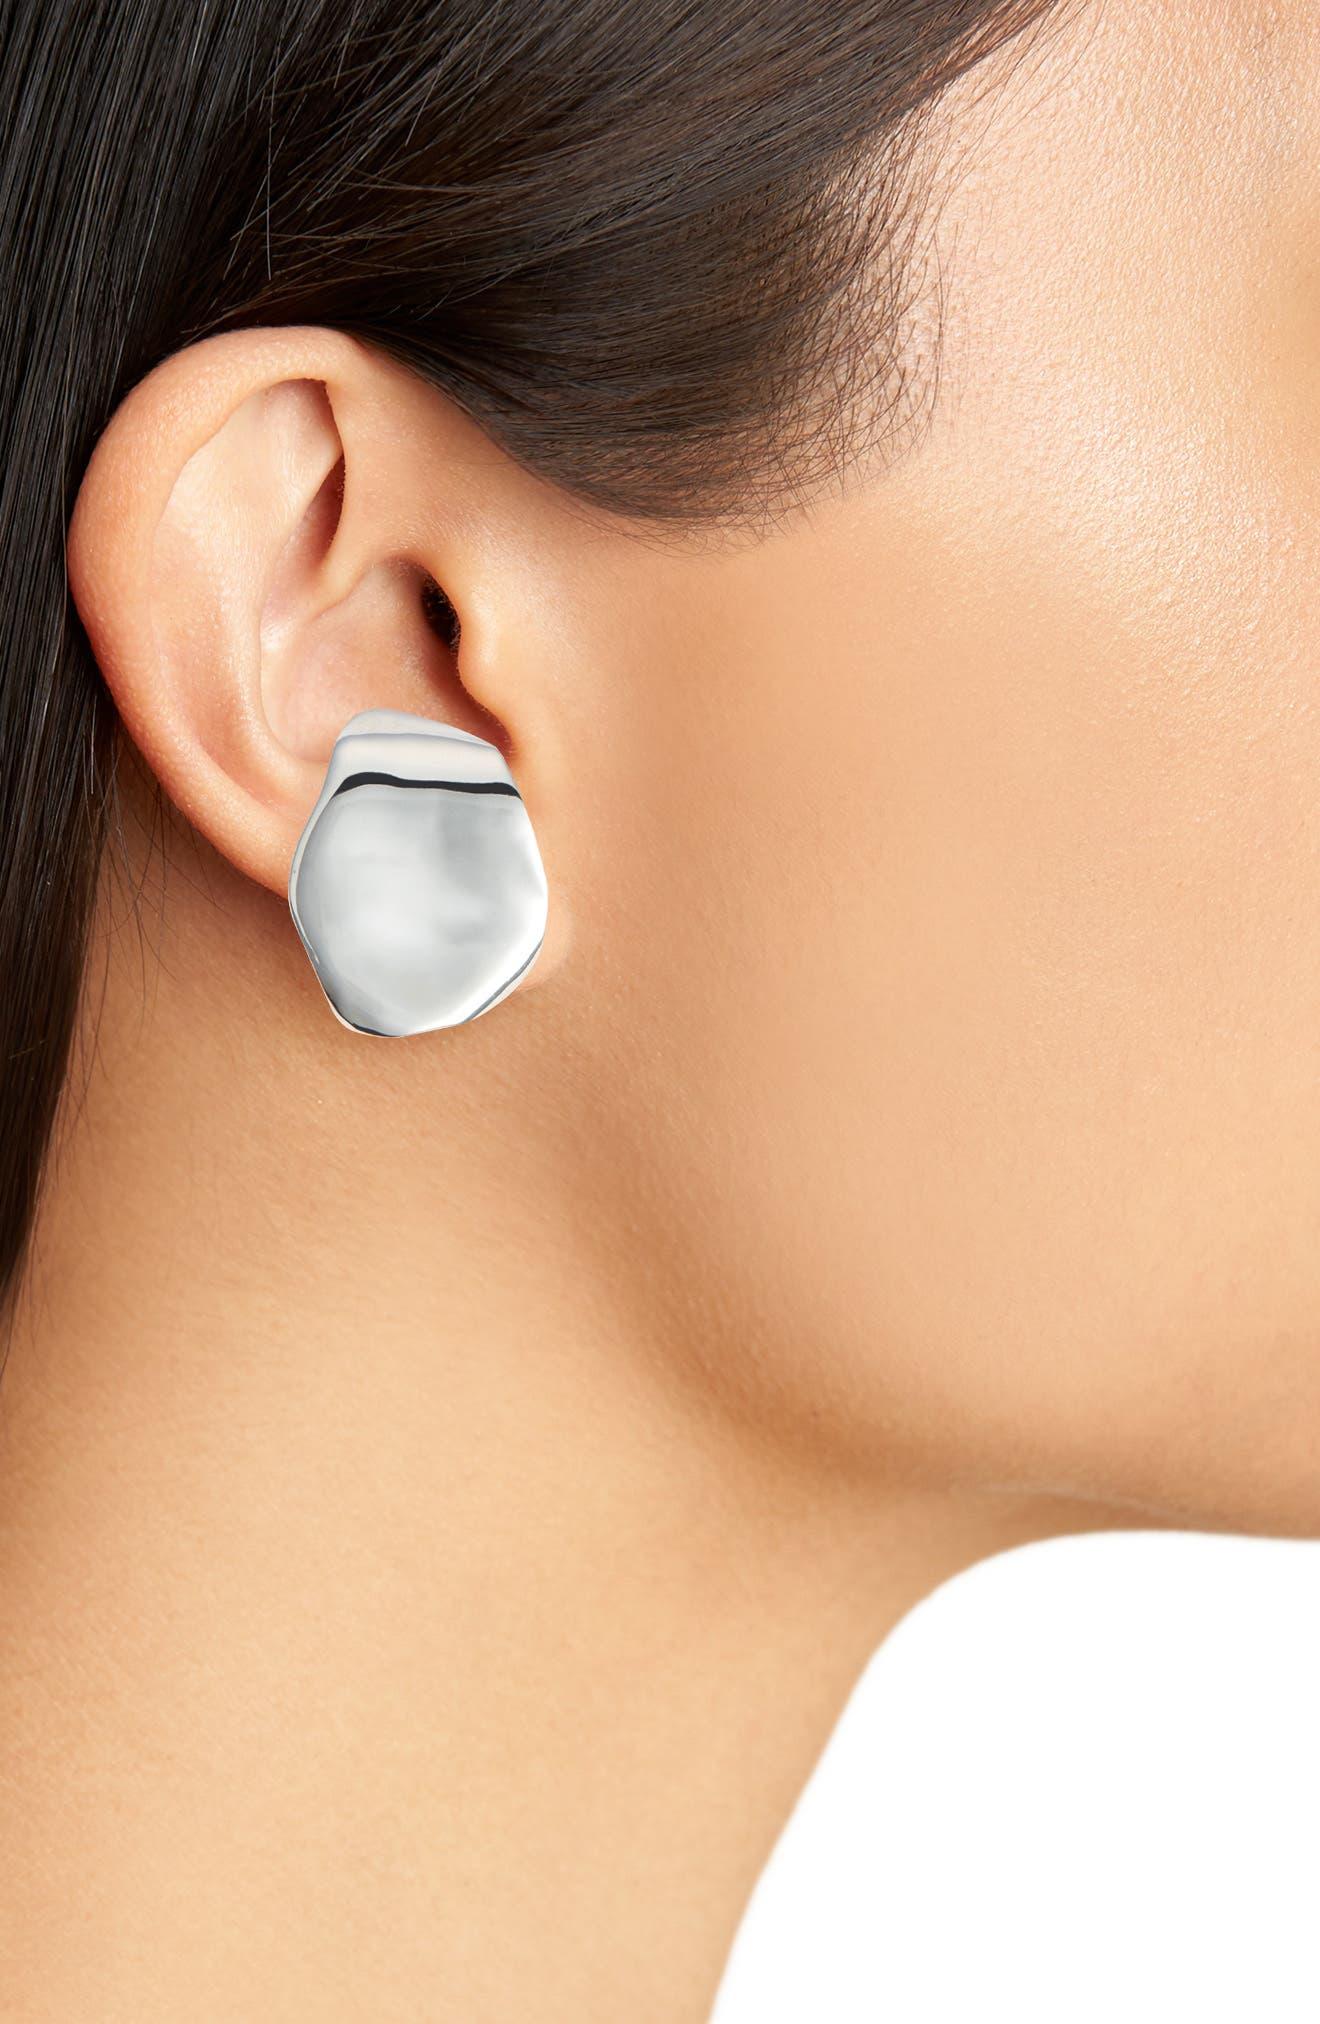 Lecca Stud Earrings,                             Alternate thumbnail 2, color,                             STERLING SILVER